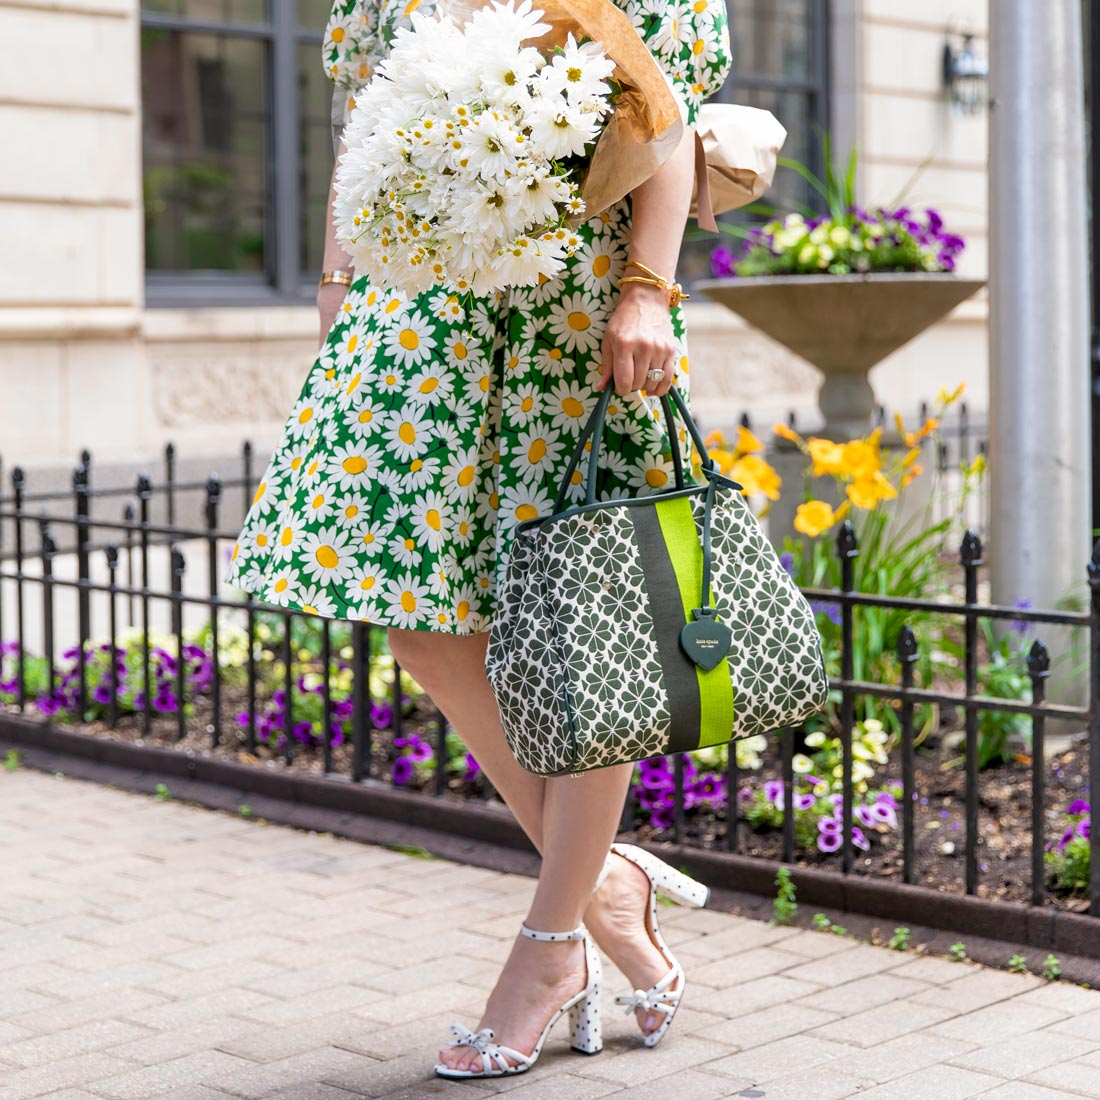 Jennifer Lake Kate Spade Green Floral Jacquard